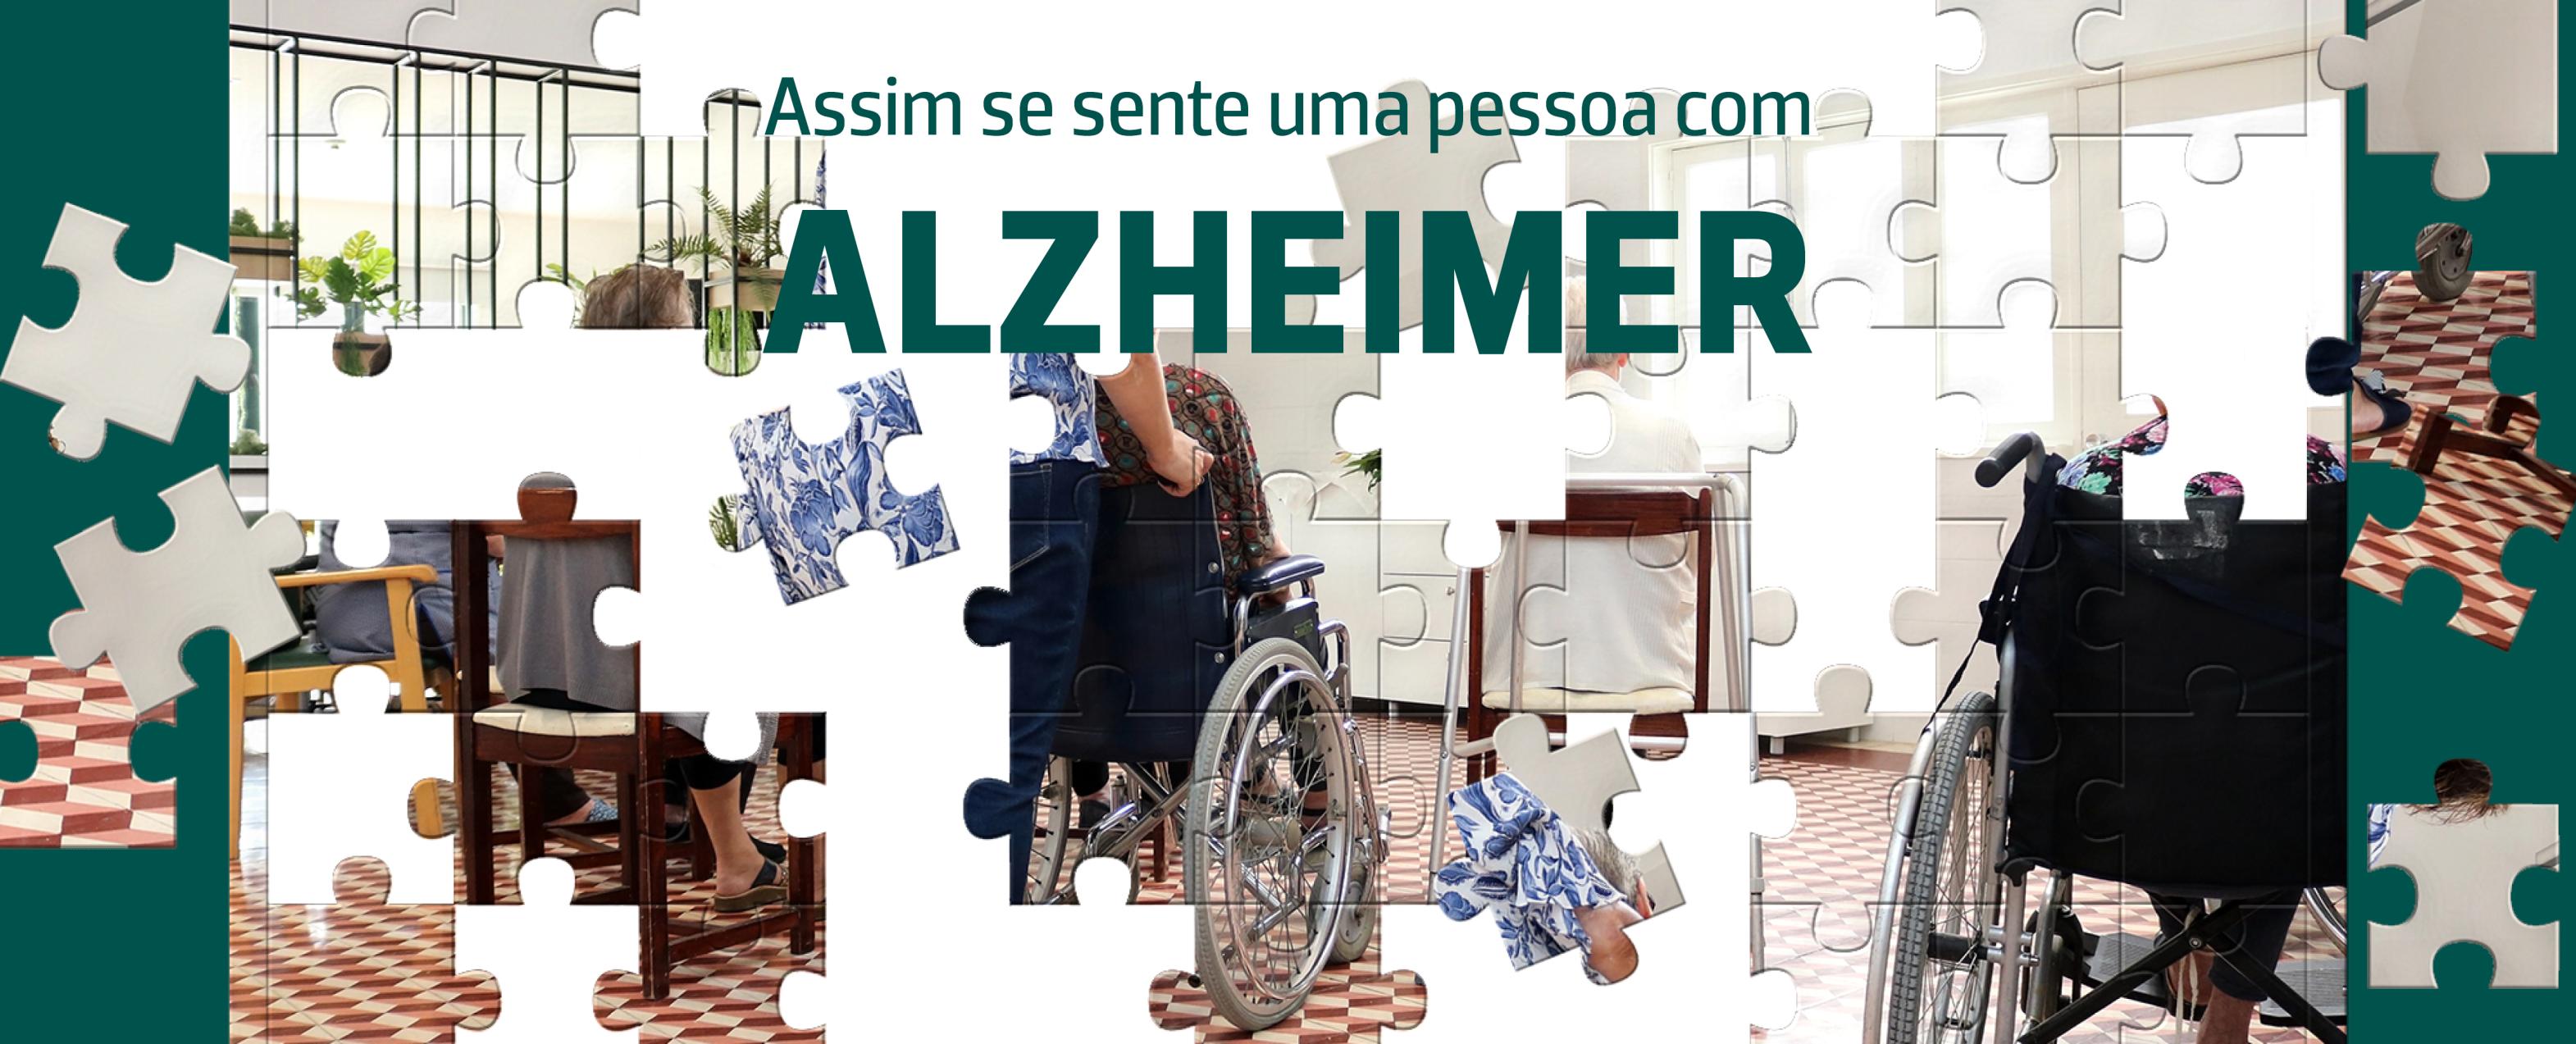 21-de-setembro-dia-mundial-da-doenca-de-alzheimer